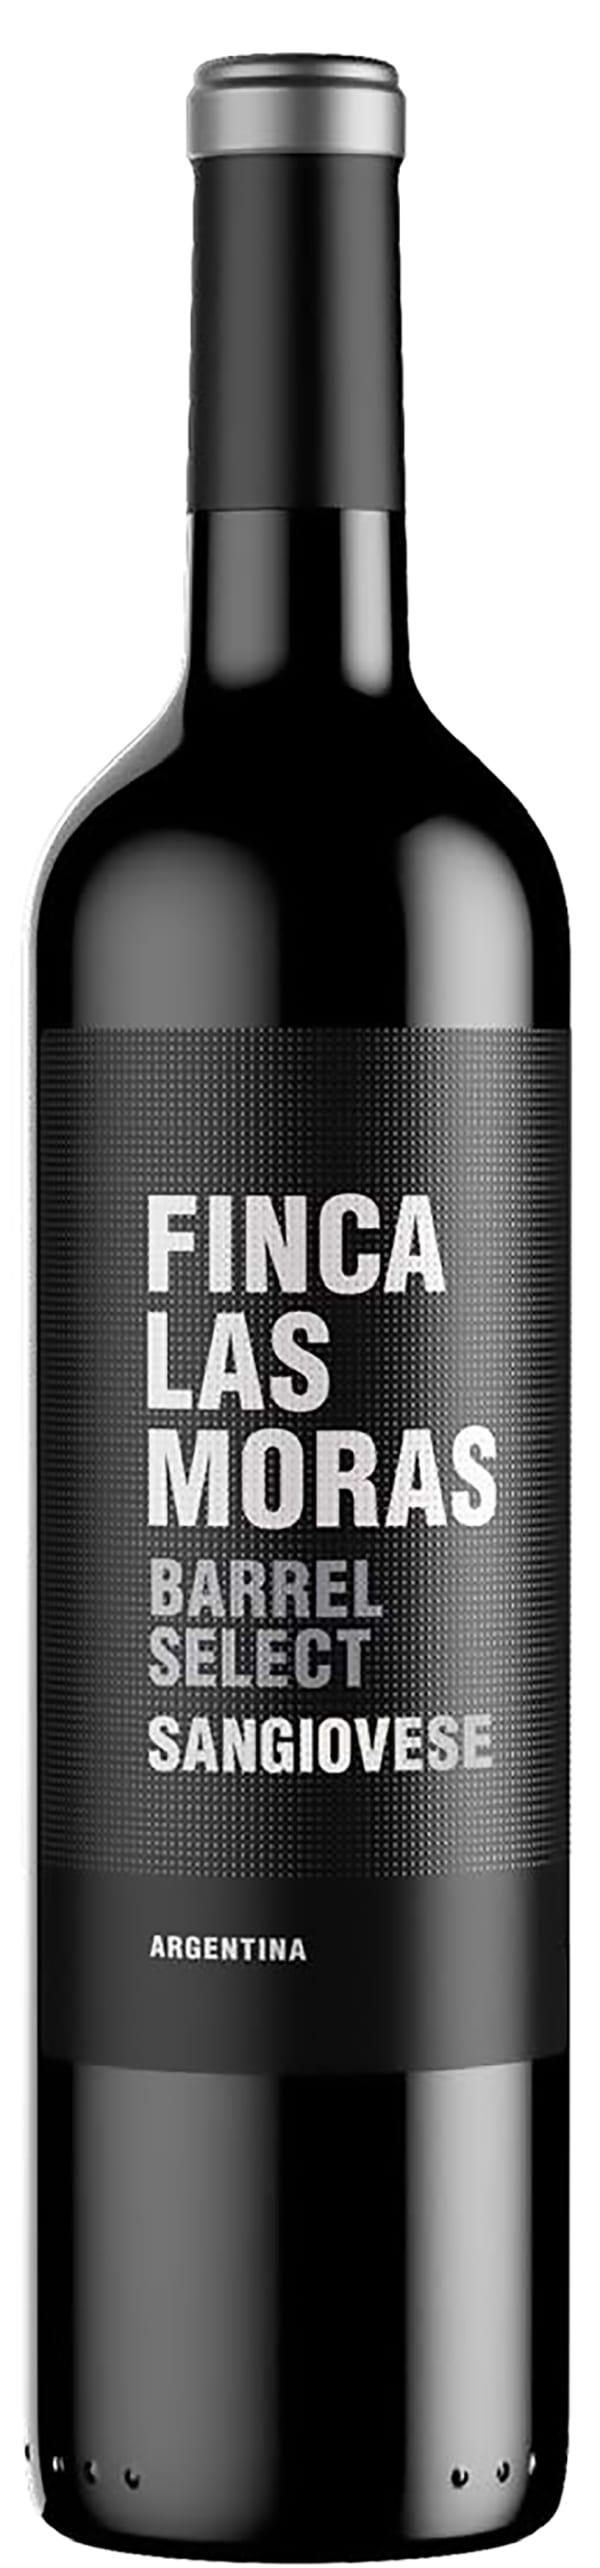 Finca Las Moras Barrel Select Sangiovese 2015